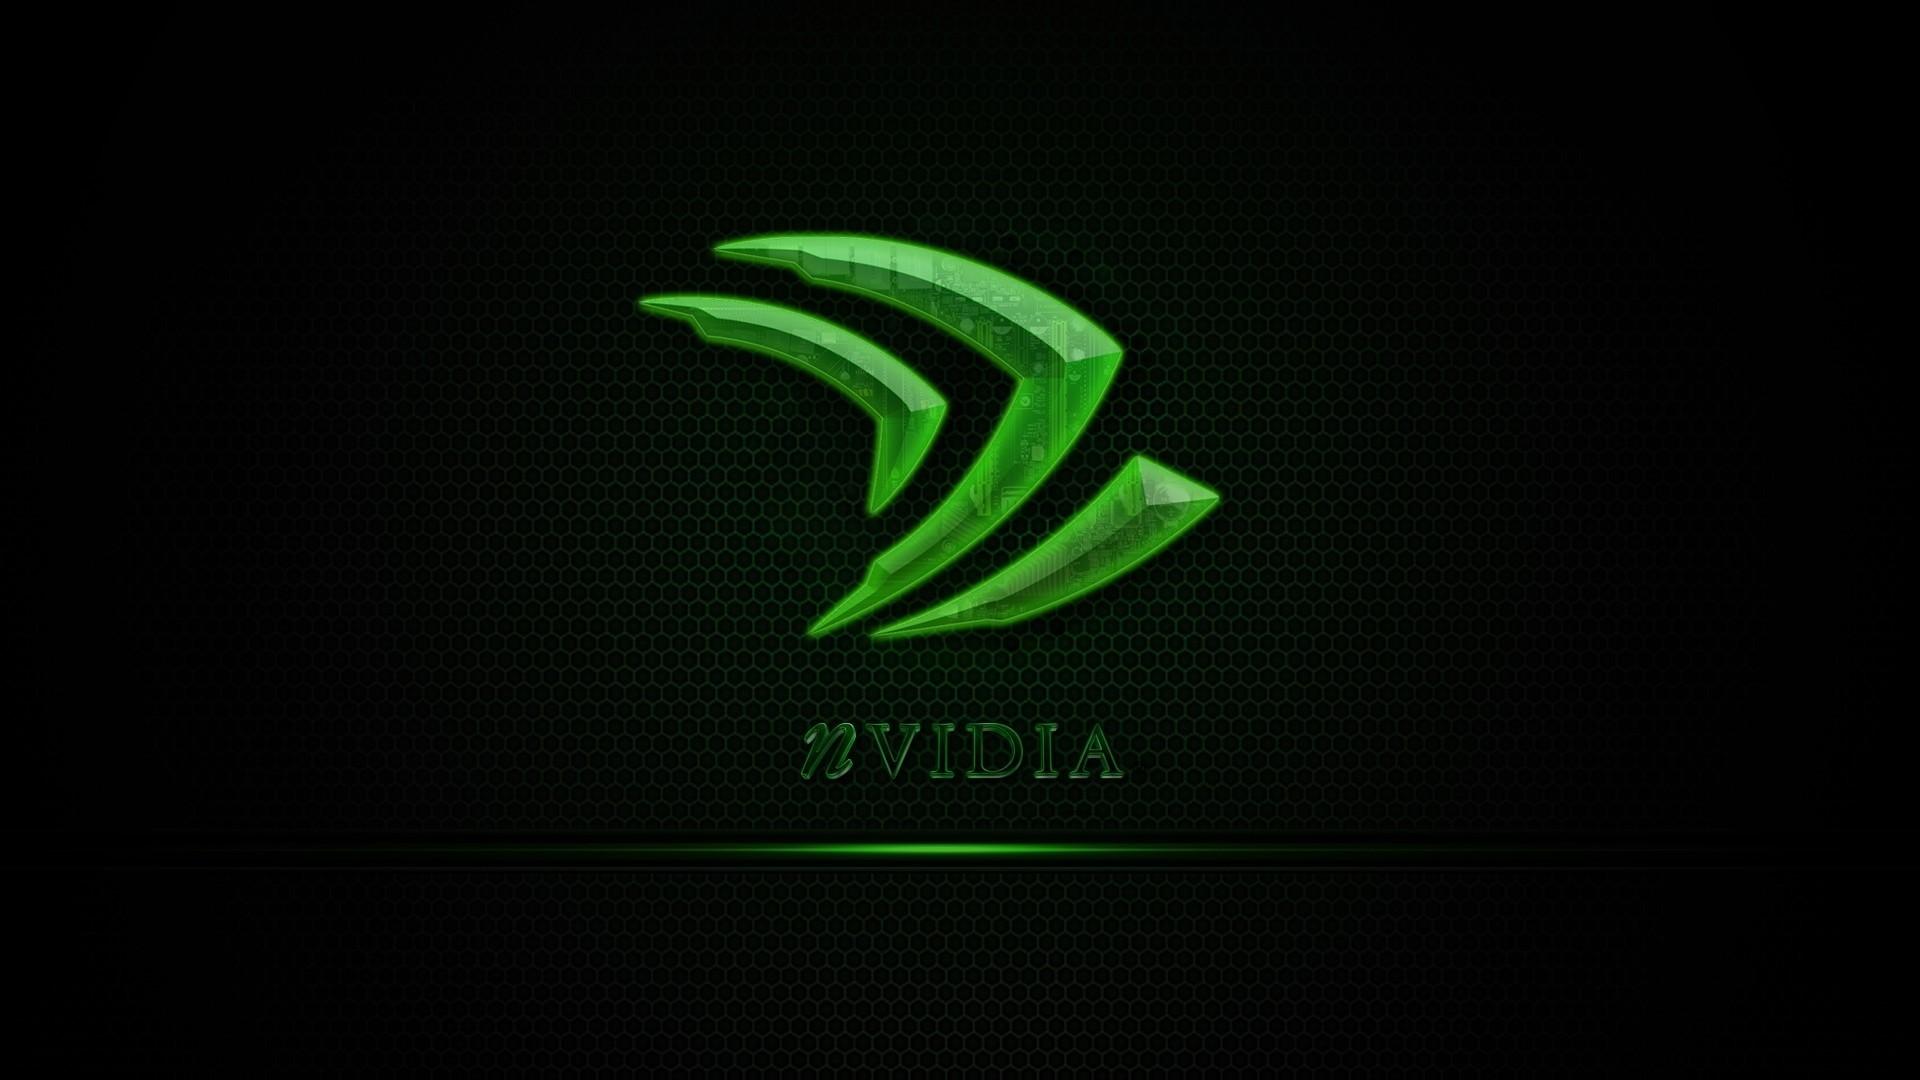 Nvidia Wallpaper for pc